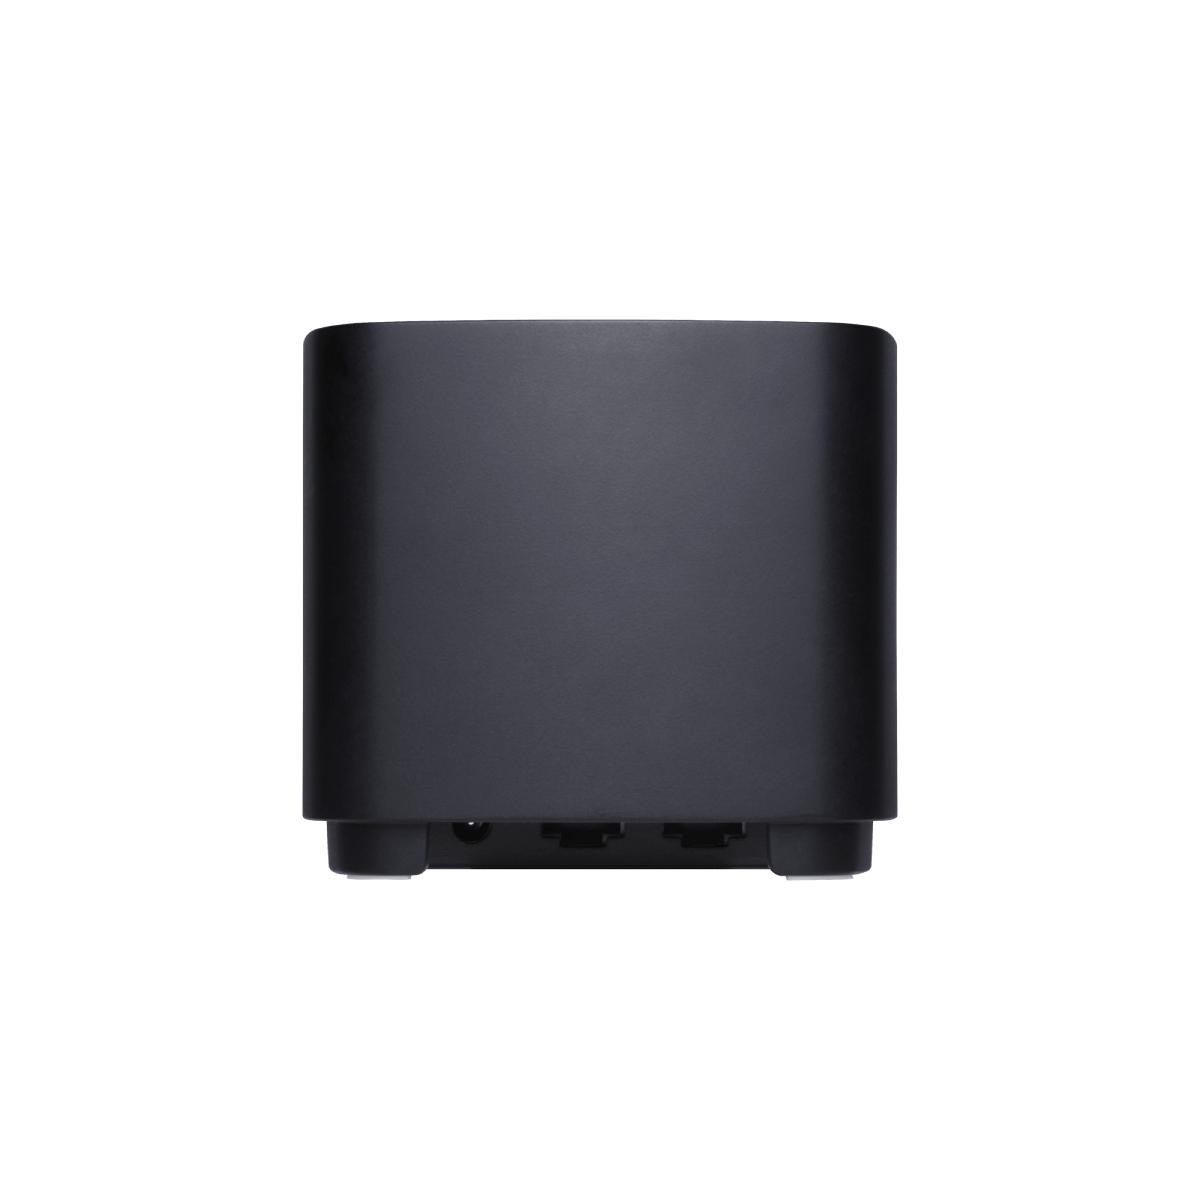 AX1800 Dual Band Mesh WiFi System